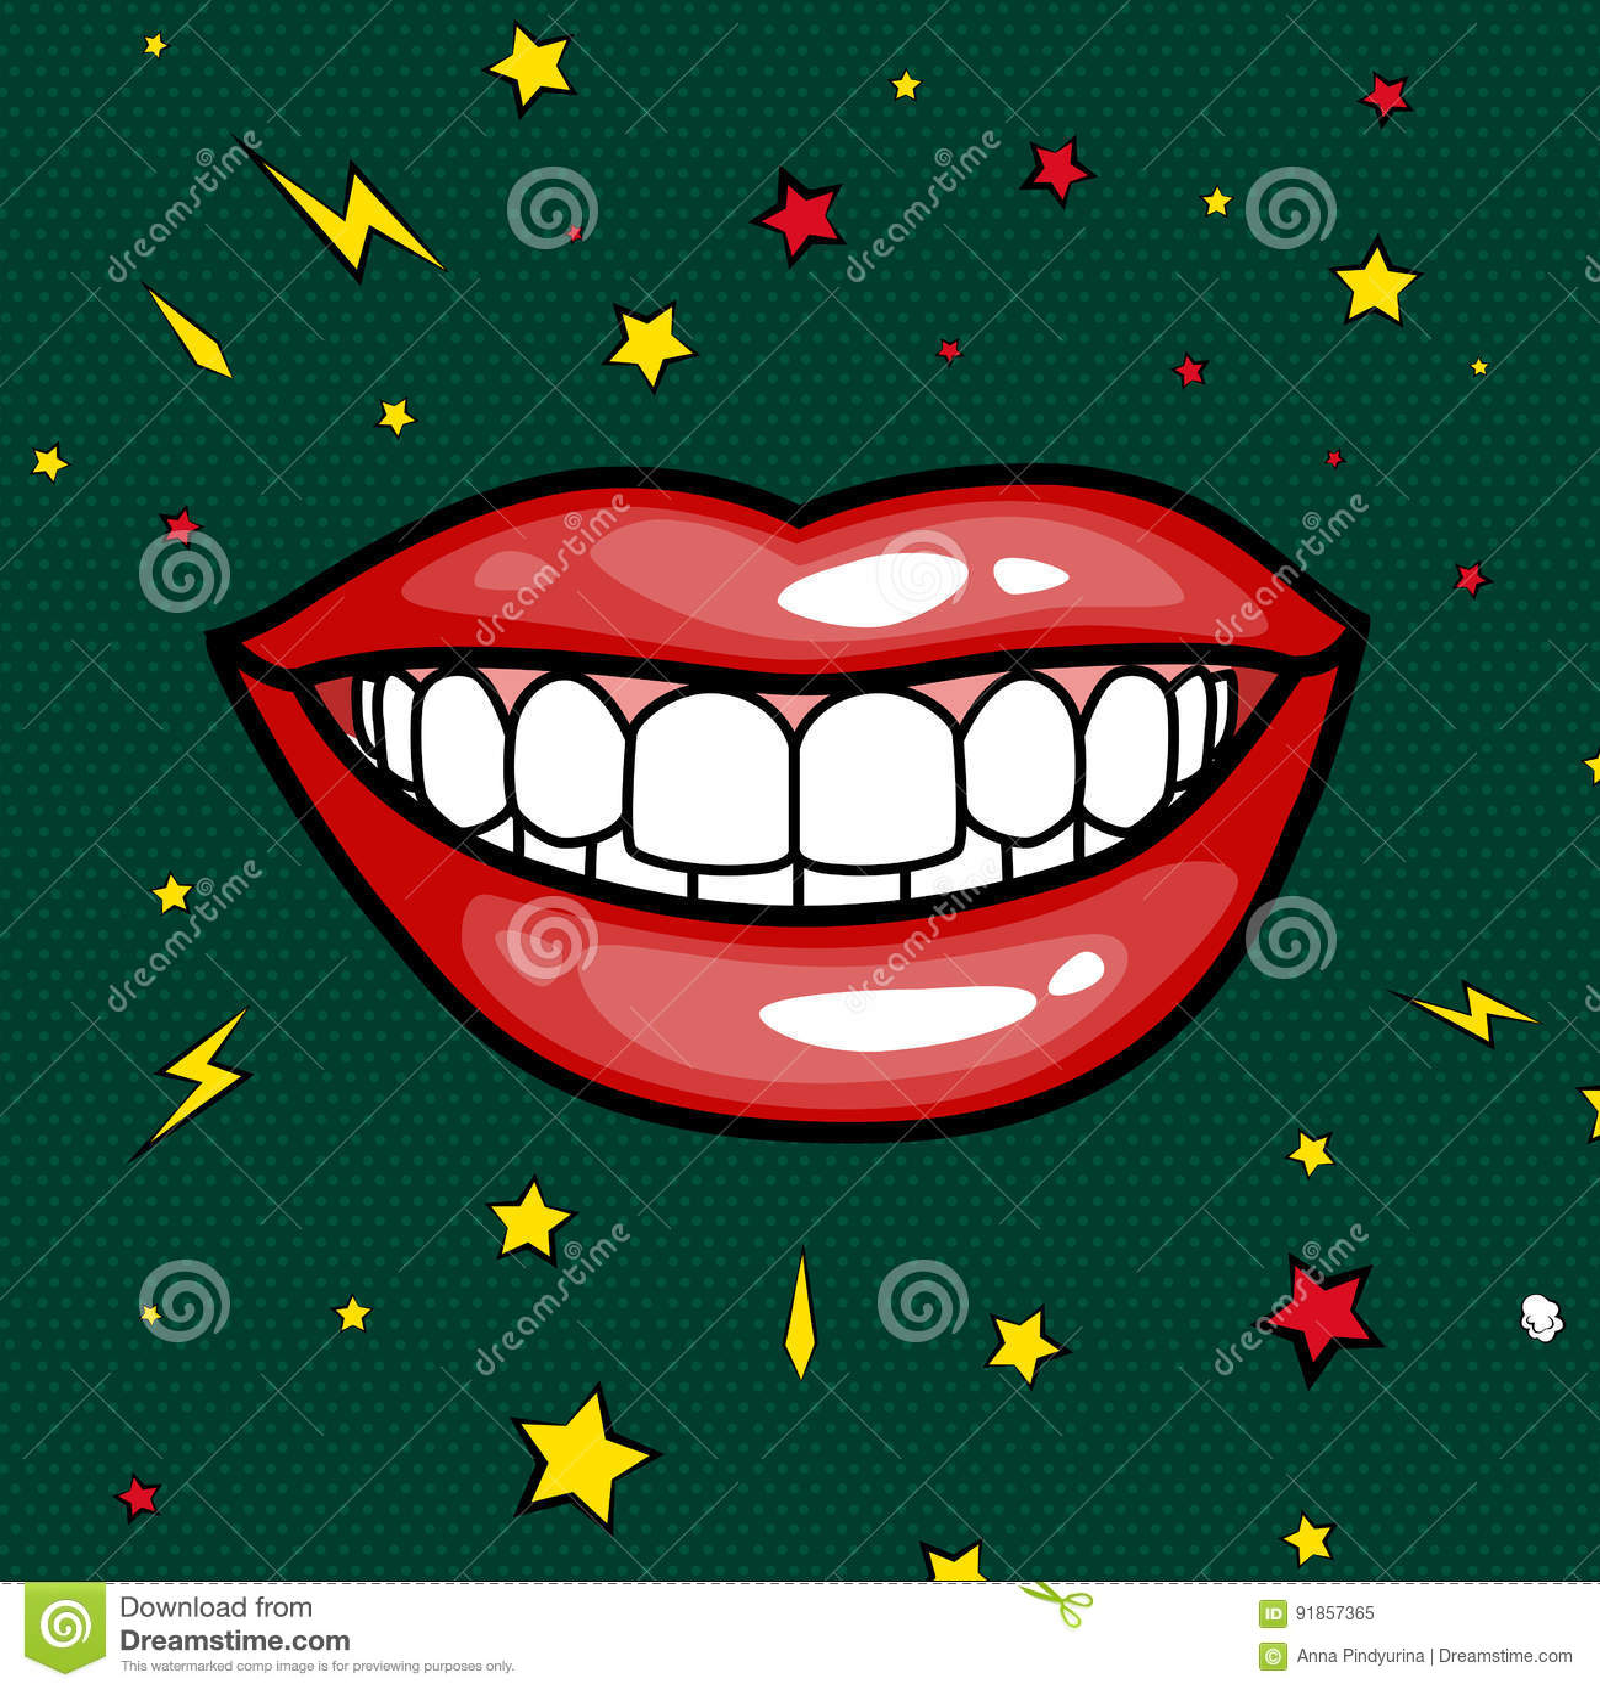 Fashion Girls Lips With Red Lipstick In Cartoon Pop Art